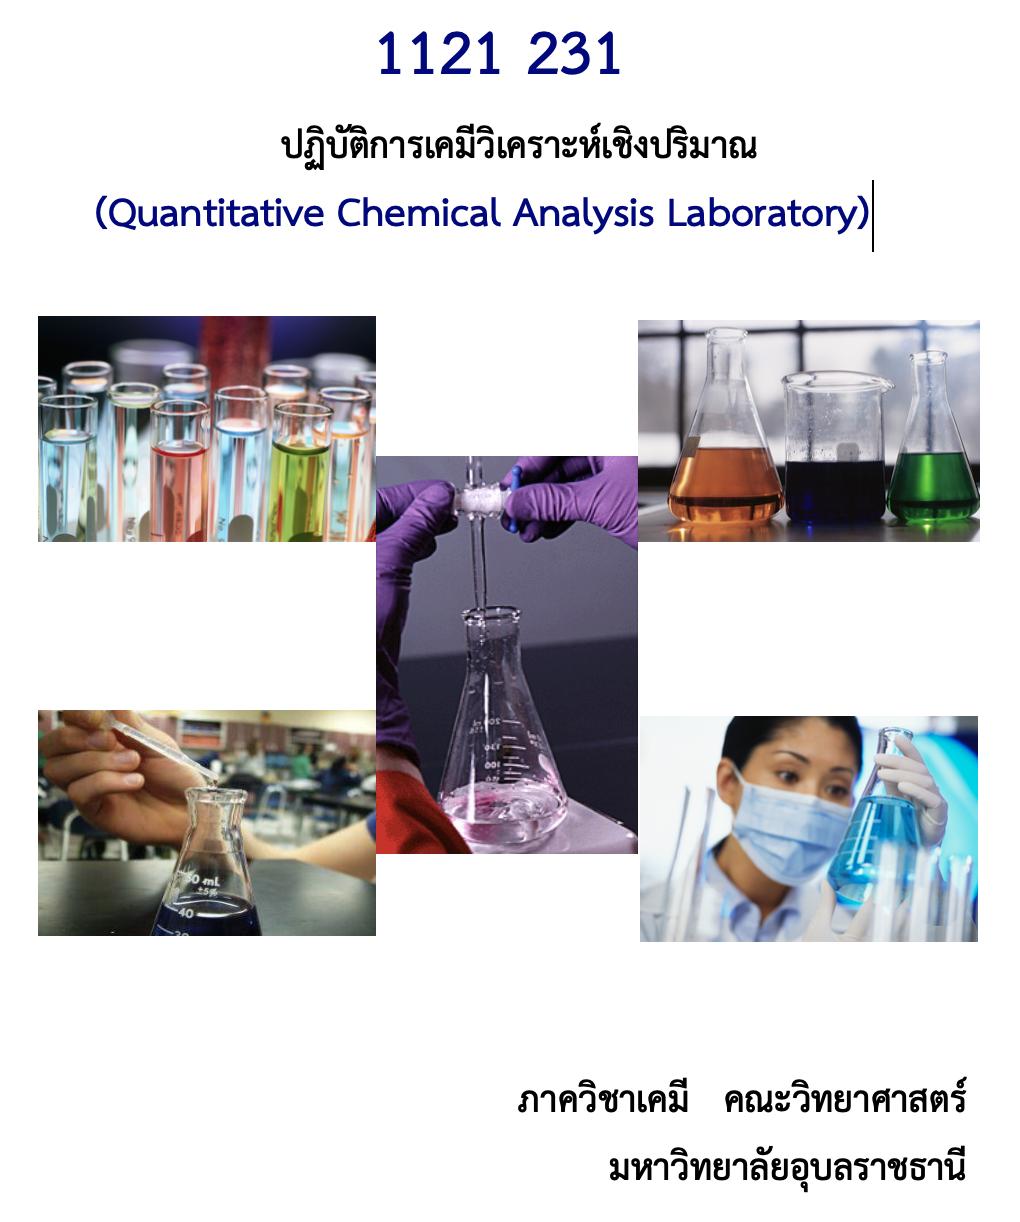 1121231 Quantitative Chemical Analysis Laboratory